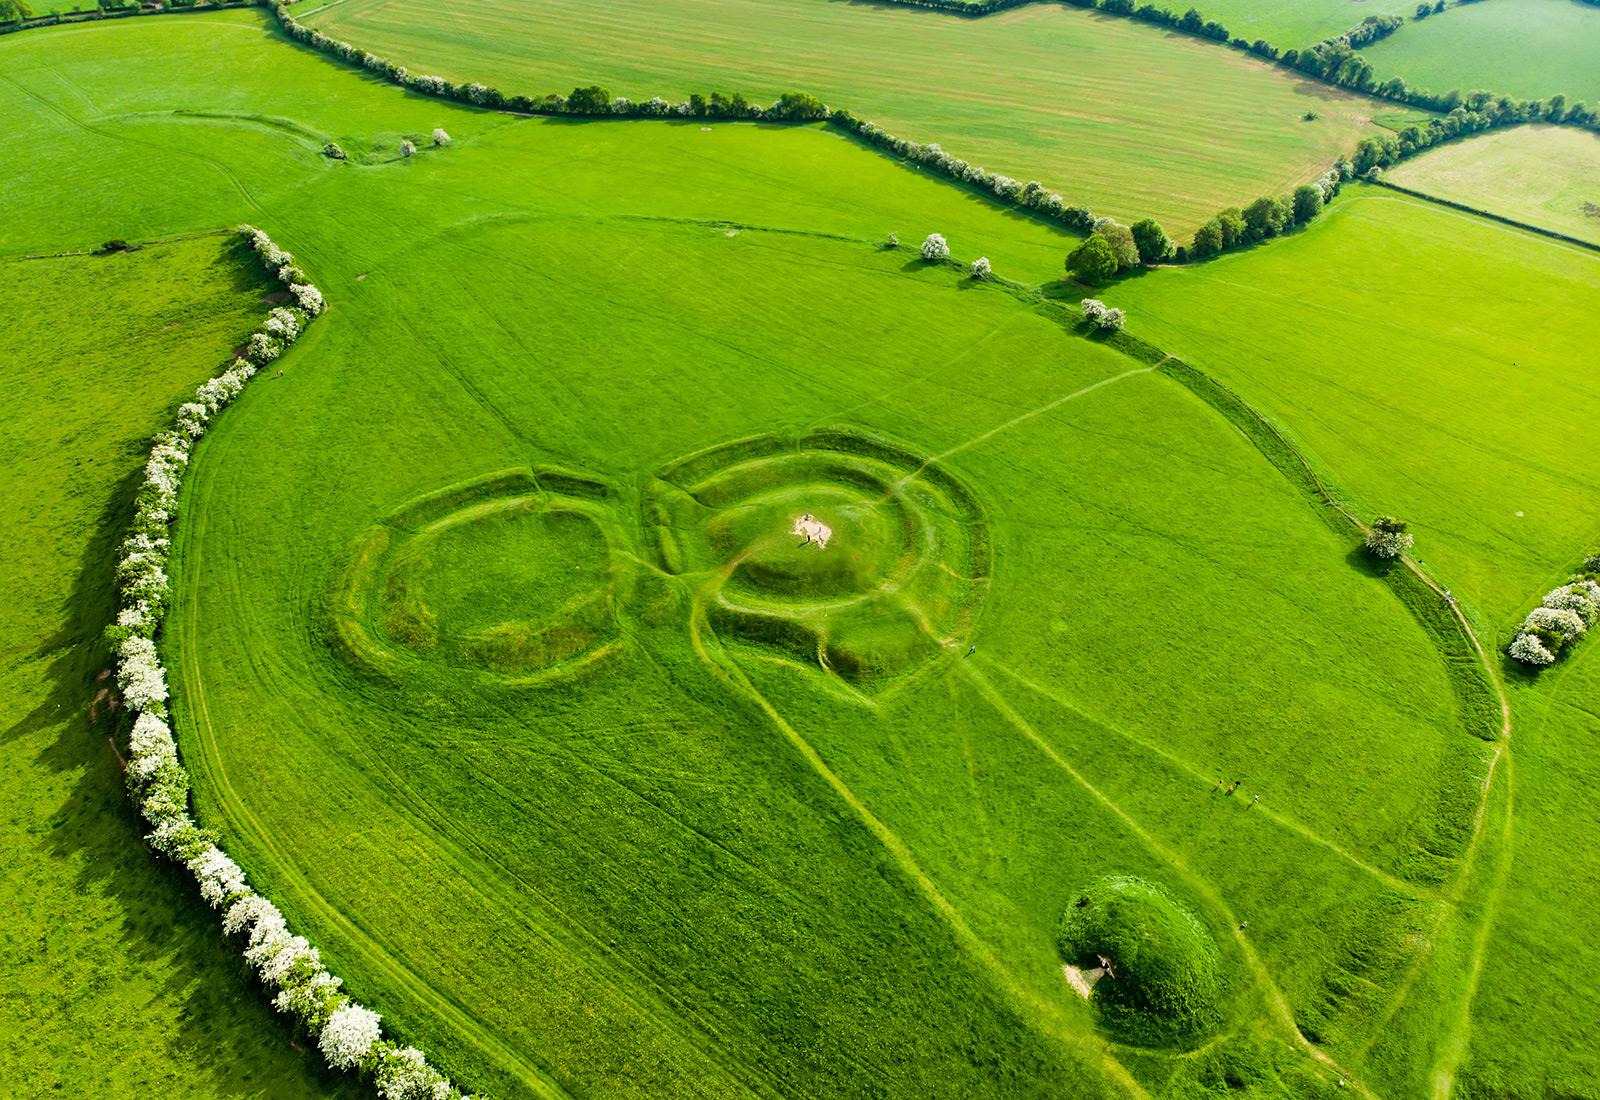 Travel Sacred Mystical Ireland - Sacred Mystical Journeysll